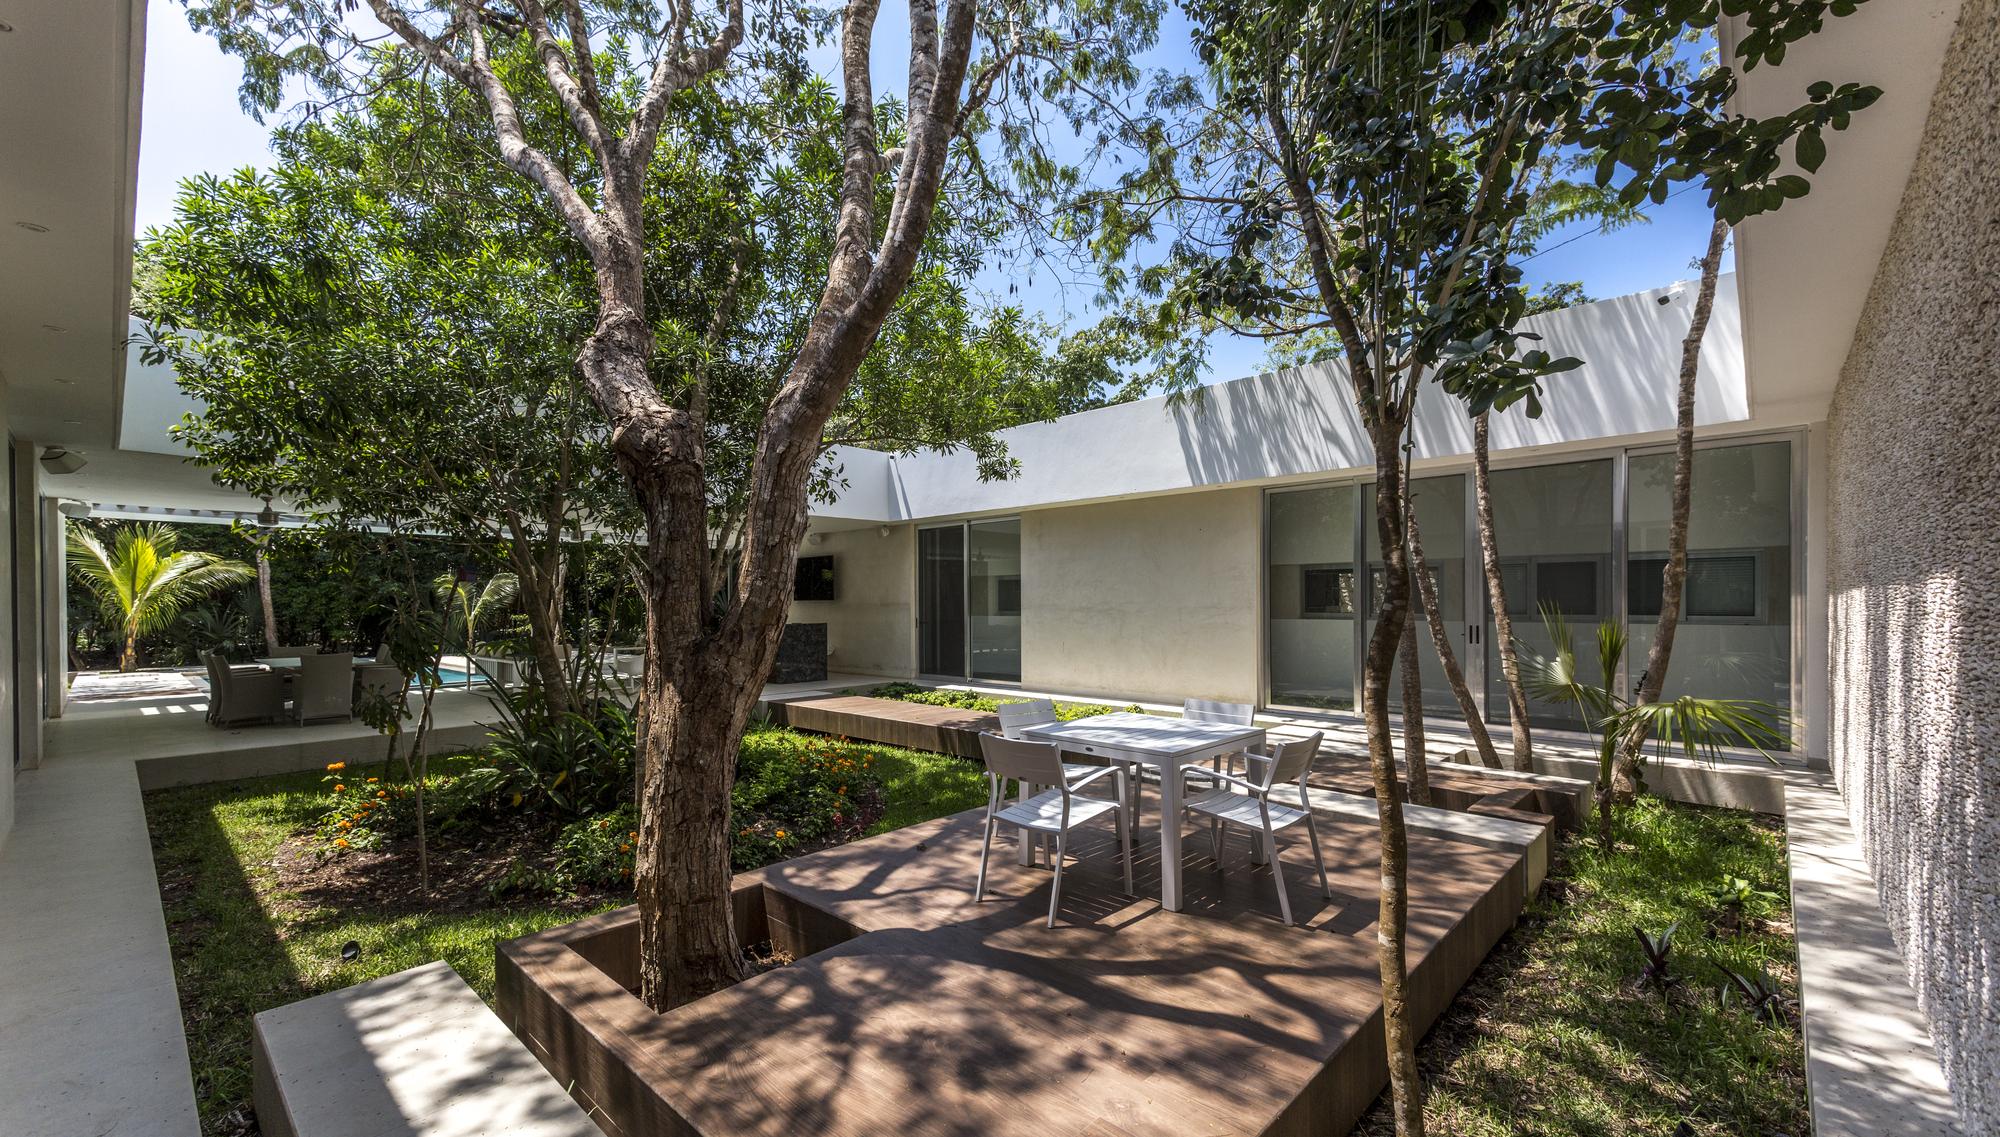 Galer a de casa entre rboles as arquitectura 4 for Arboles para interior casa